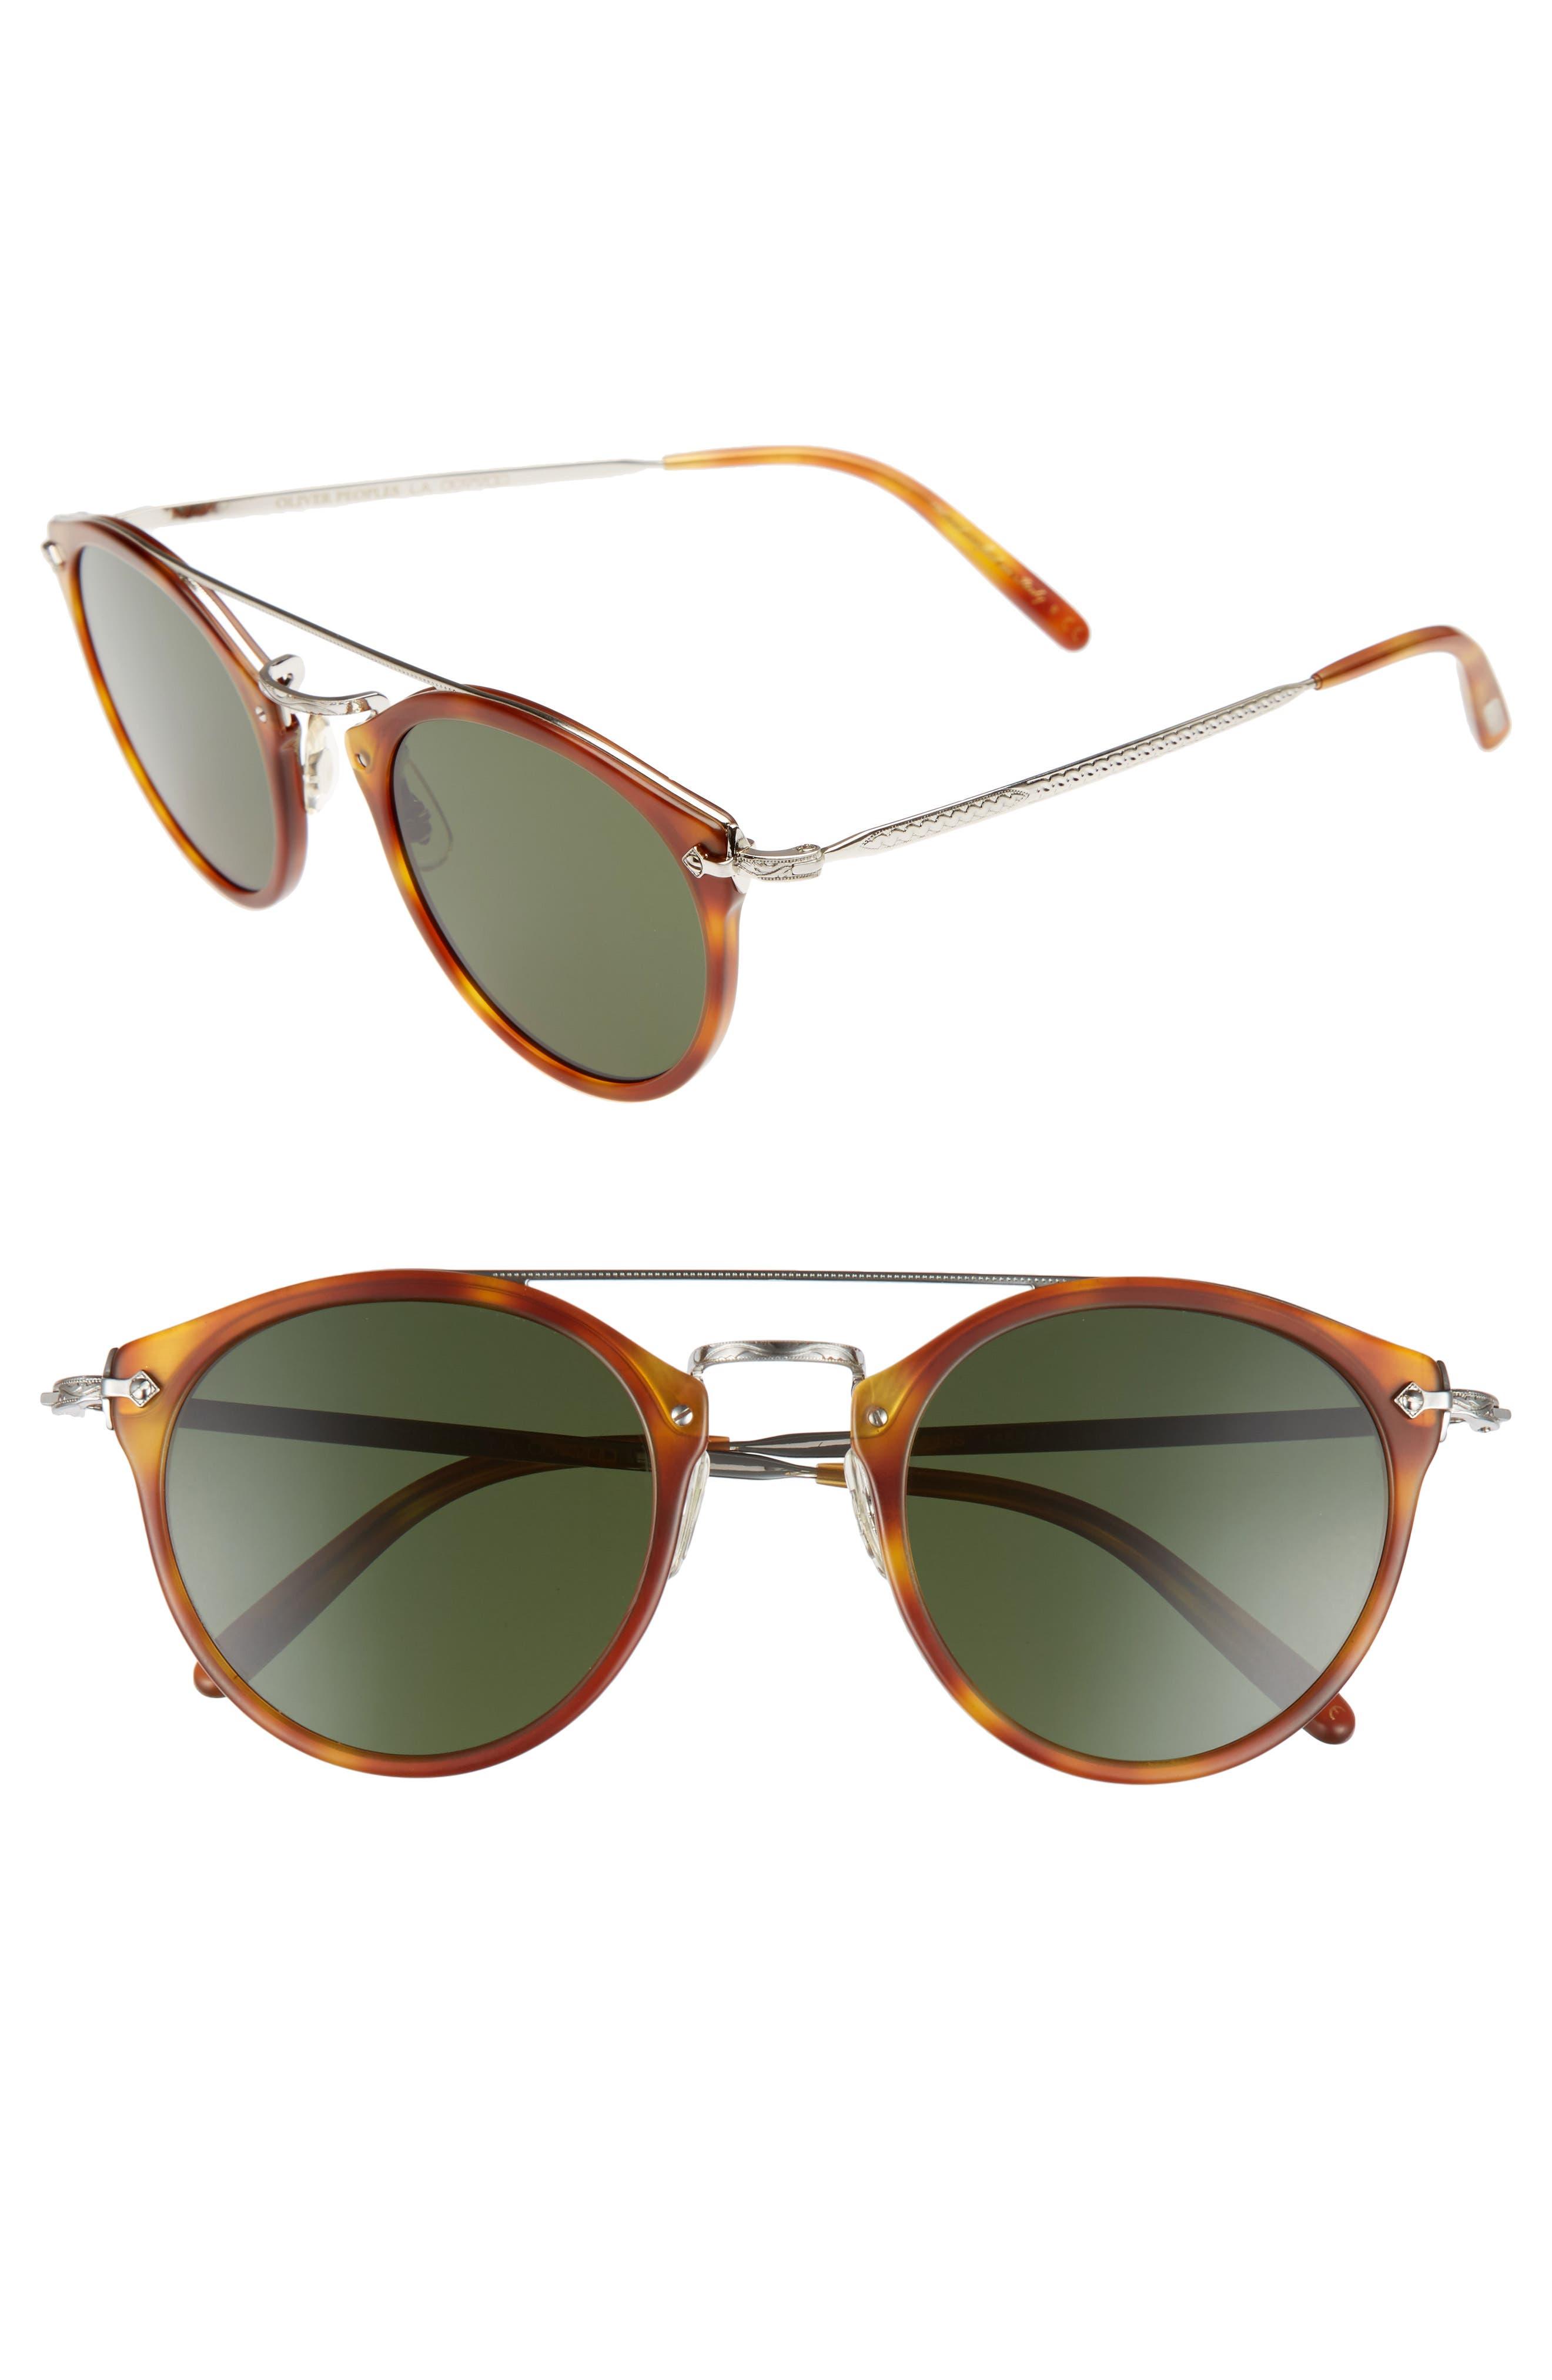 Remick 50mm Sunglasses,                         Main,                         color, Semi-Matte Light Brown